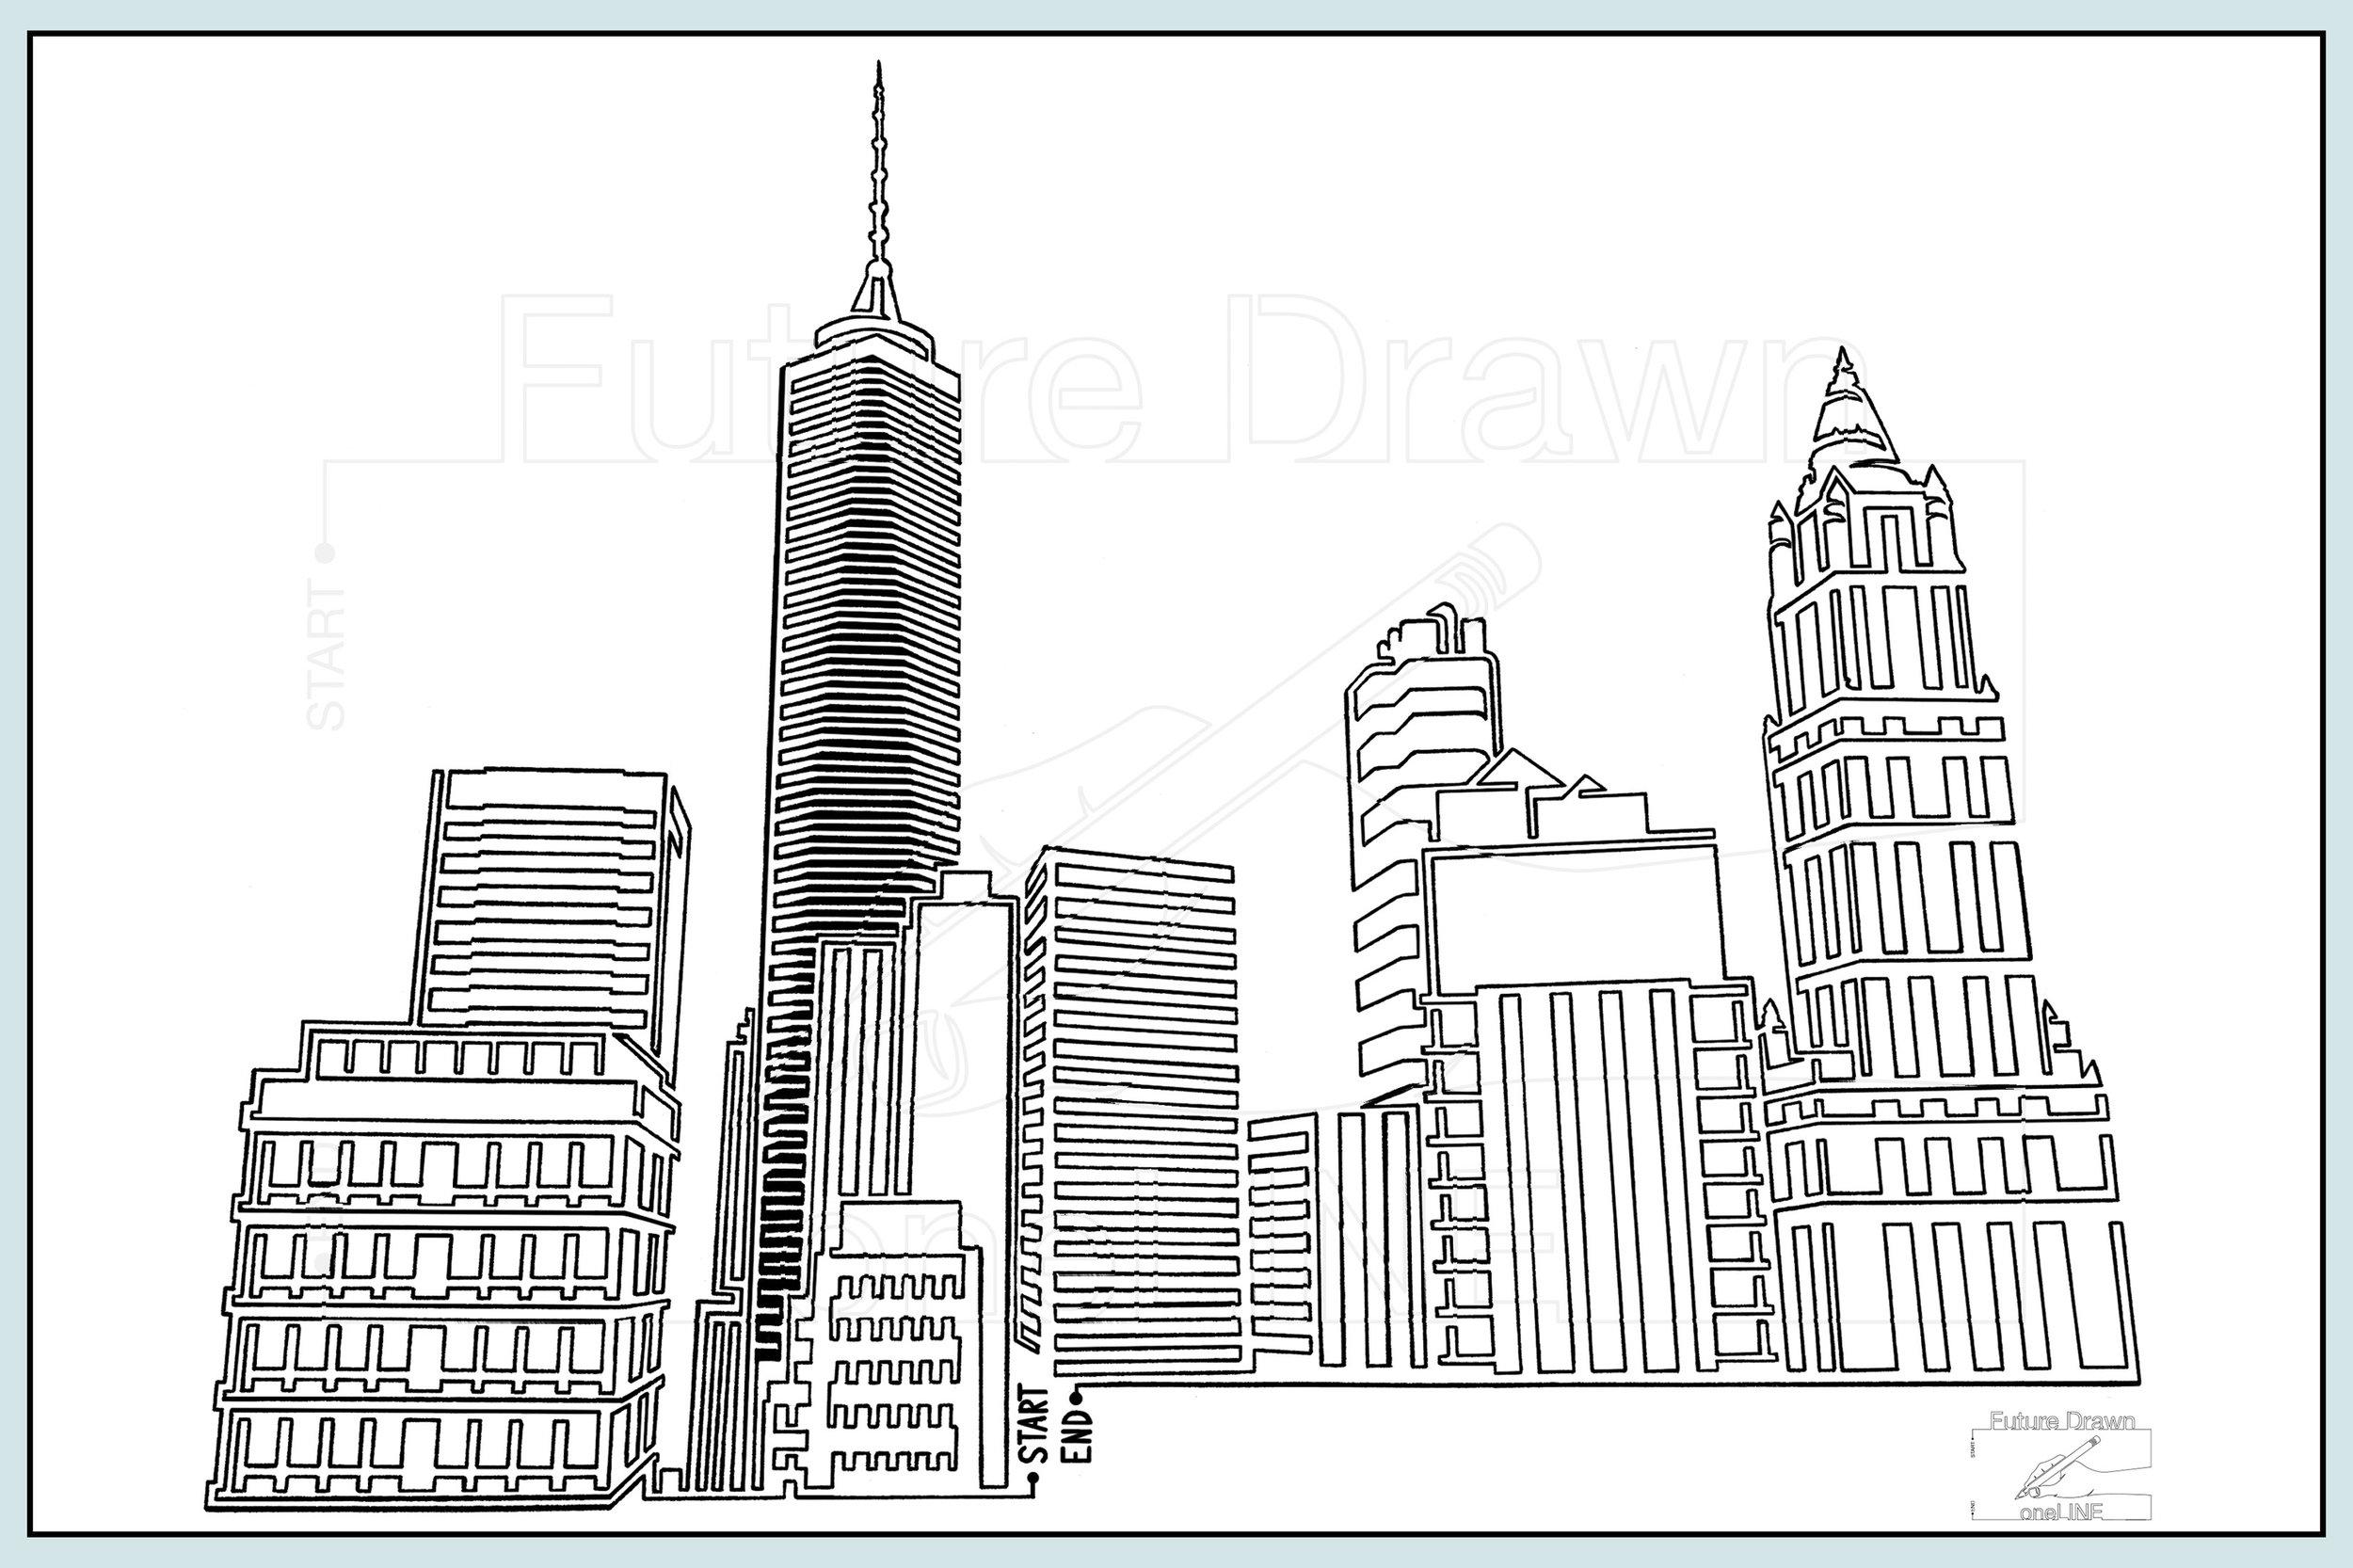 Web-Gallery Item- Ney York Skyline- oneLINE Future Drawn Applegate.jpg